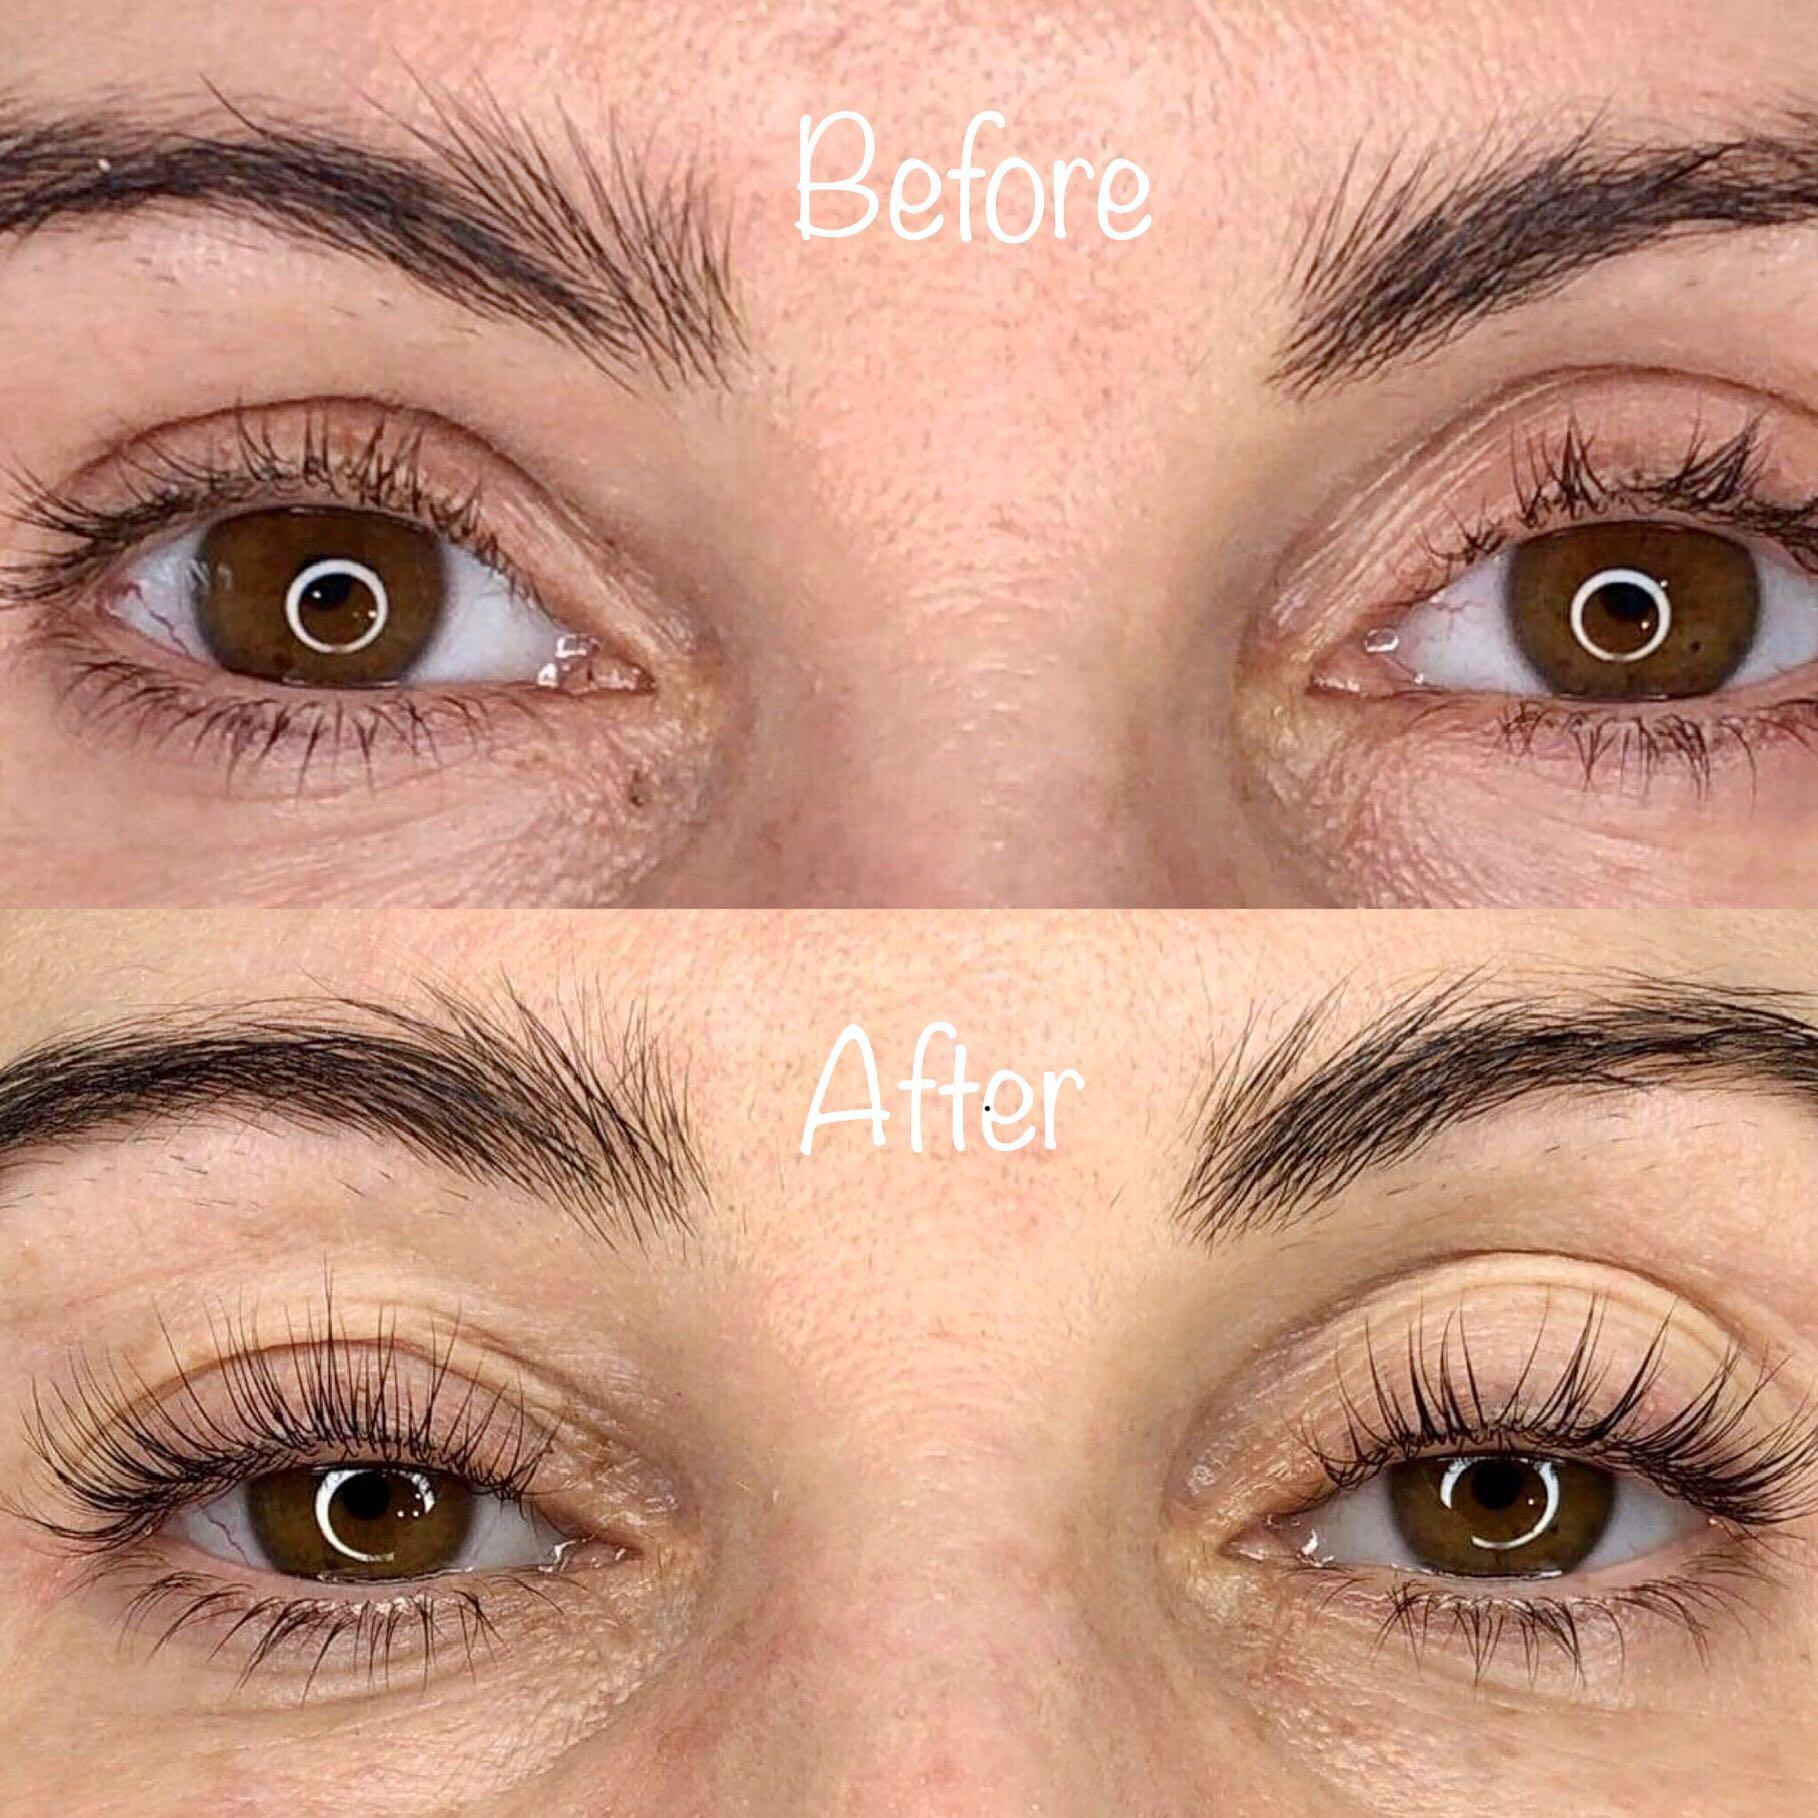 Lash Lift and Lash Botox - Rebuild your lashes with Keratin Treatment